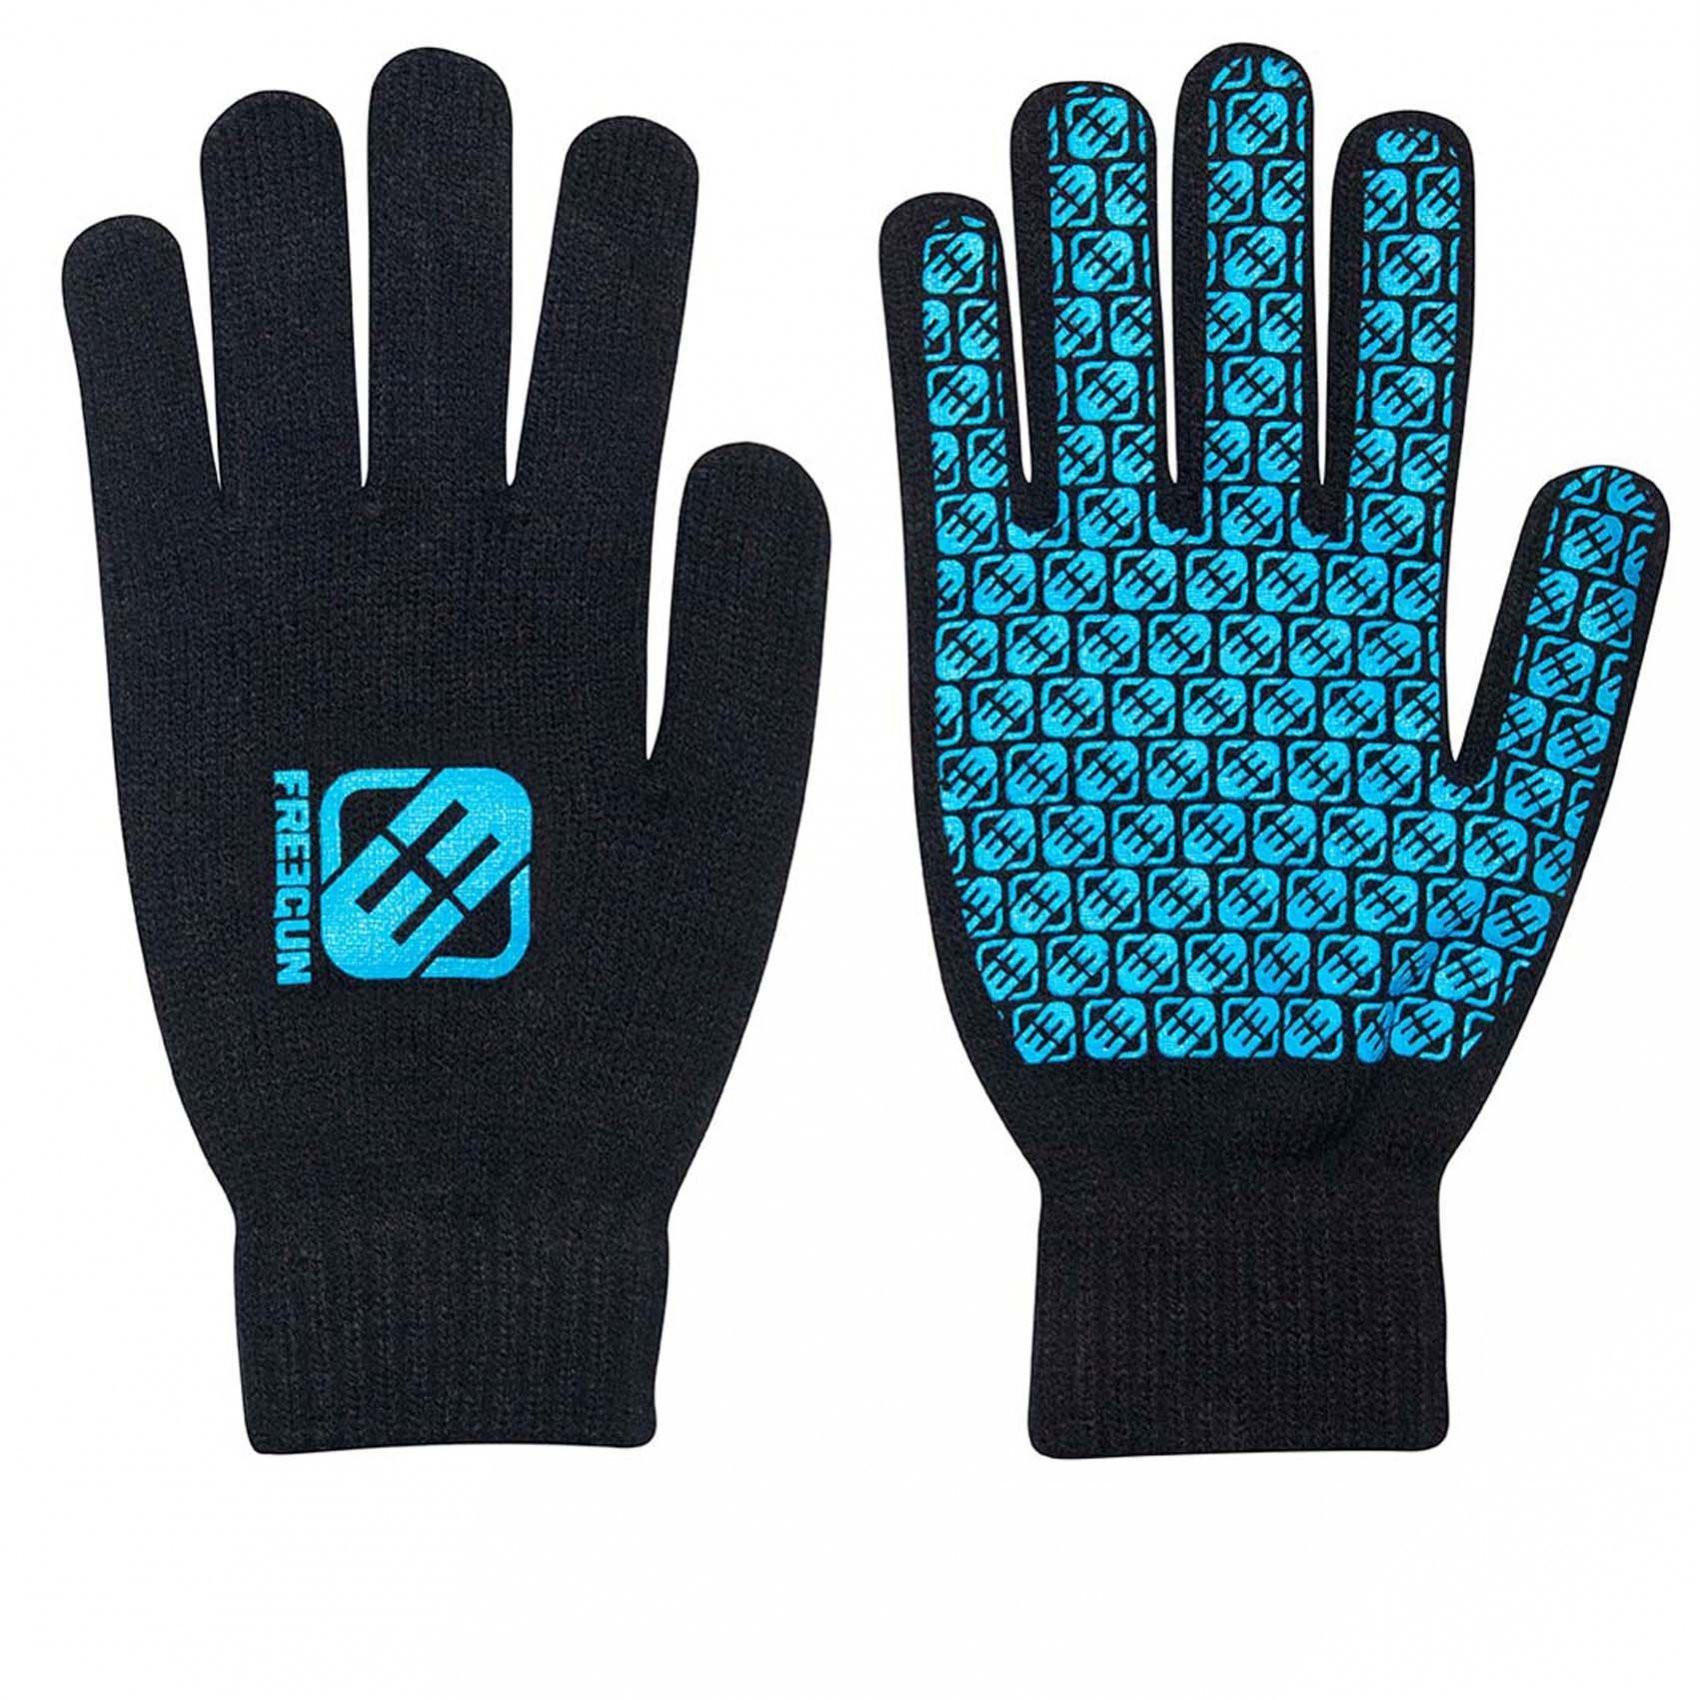 Paire de gants homme logo bleu freegun (photo)